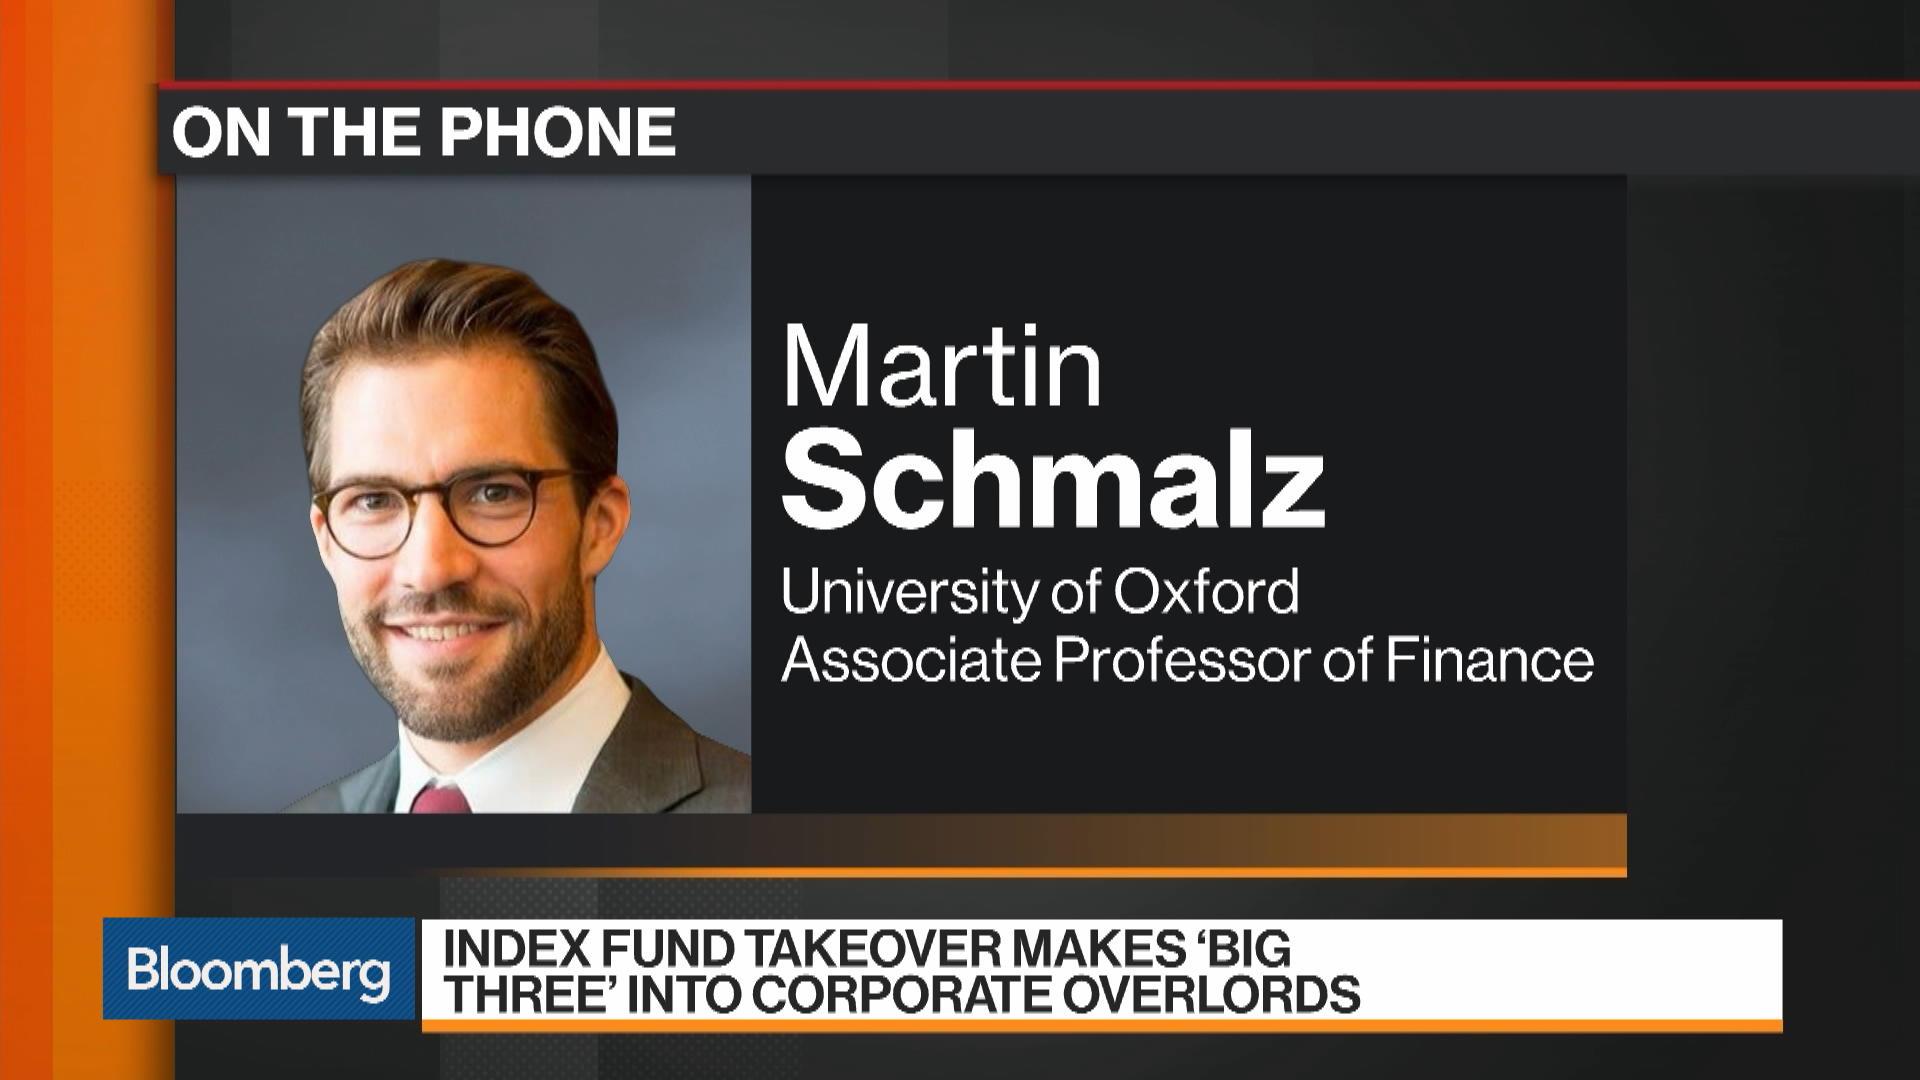 Index Fund Giants Draw Antitrust Scrutiny in U.S. Merger Reviews